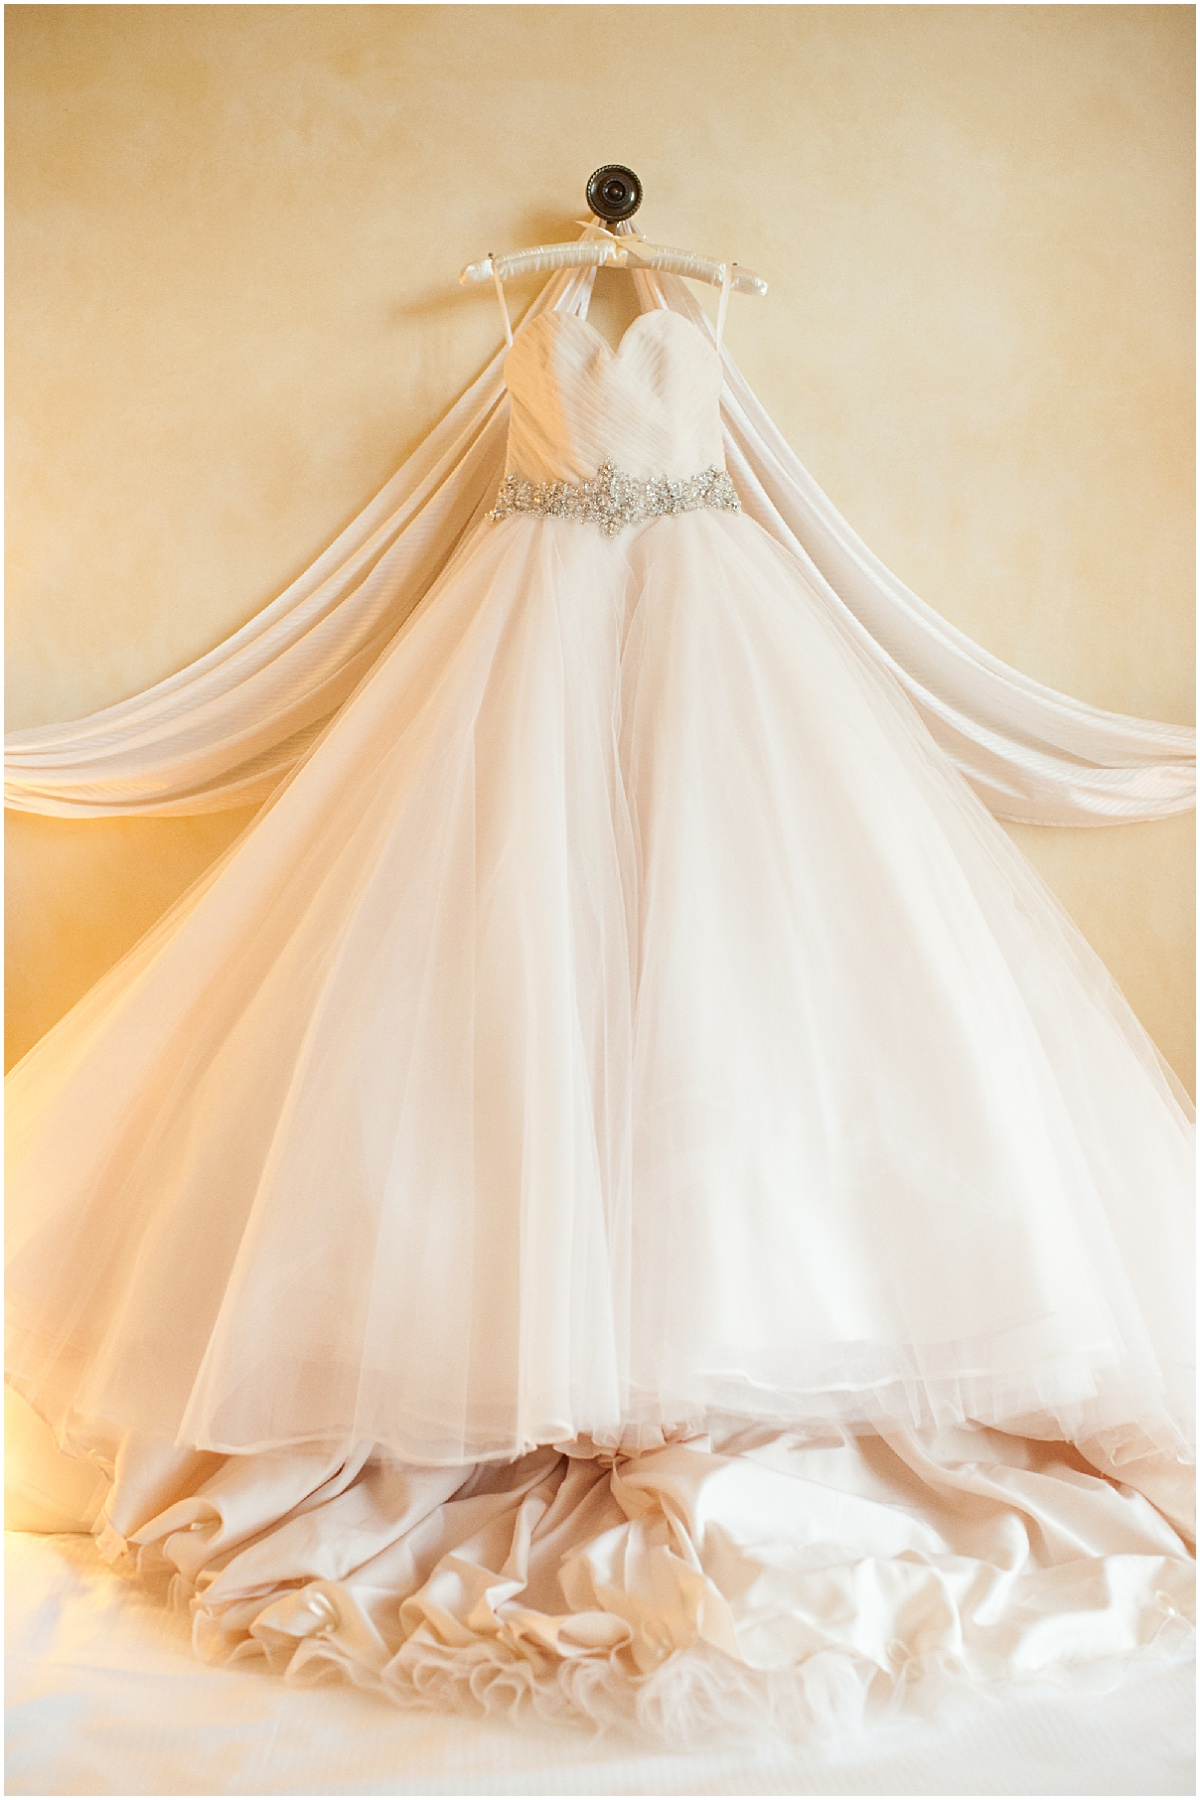 white ballgown wedding dress hung at the biltmore hotel